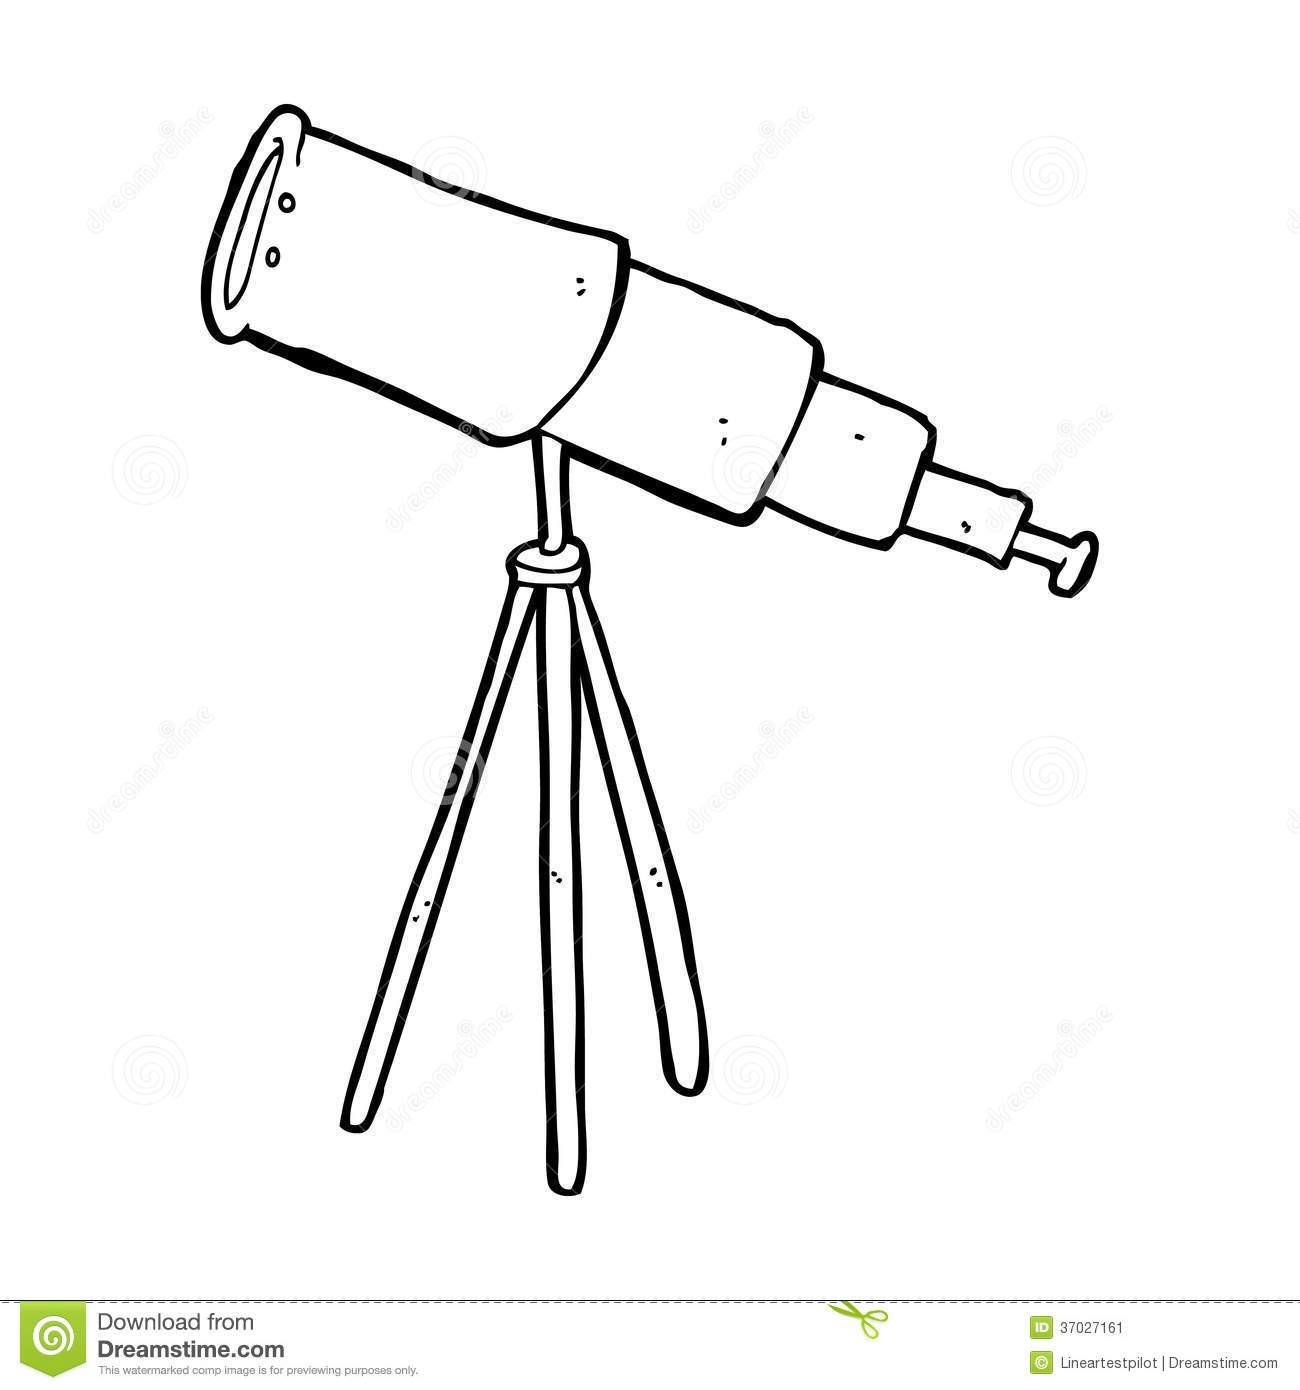 Telescope black and white clipart svg stock Telescope clipart black and white 4 » Clipart Portal svg stock